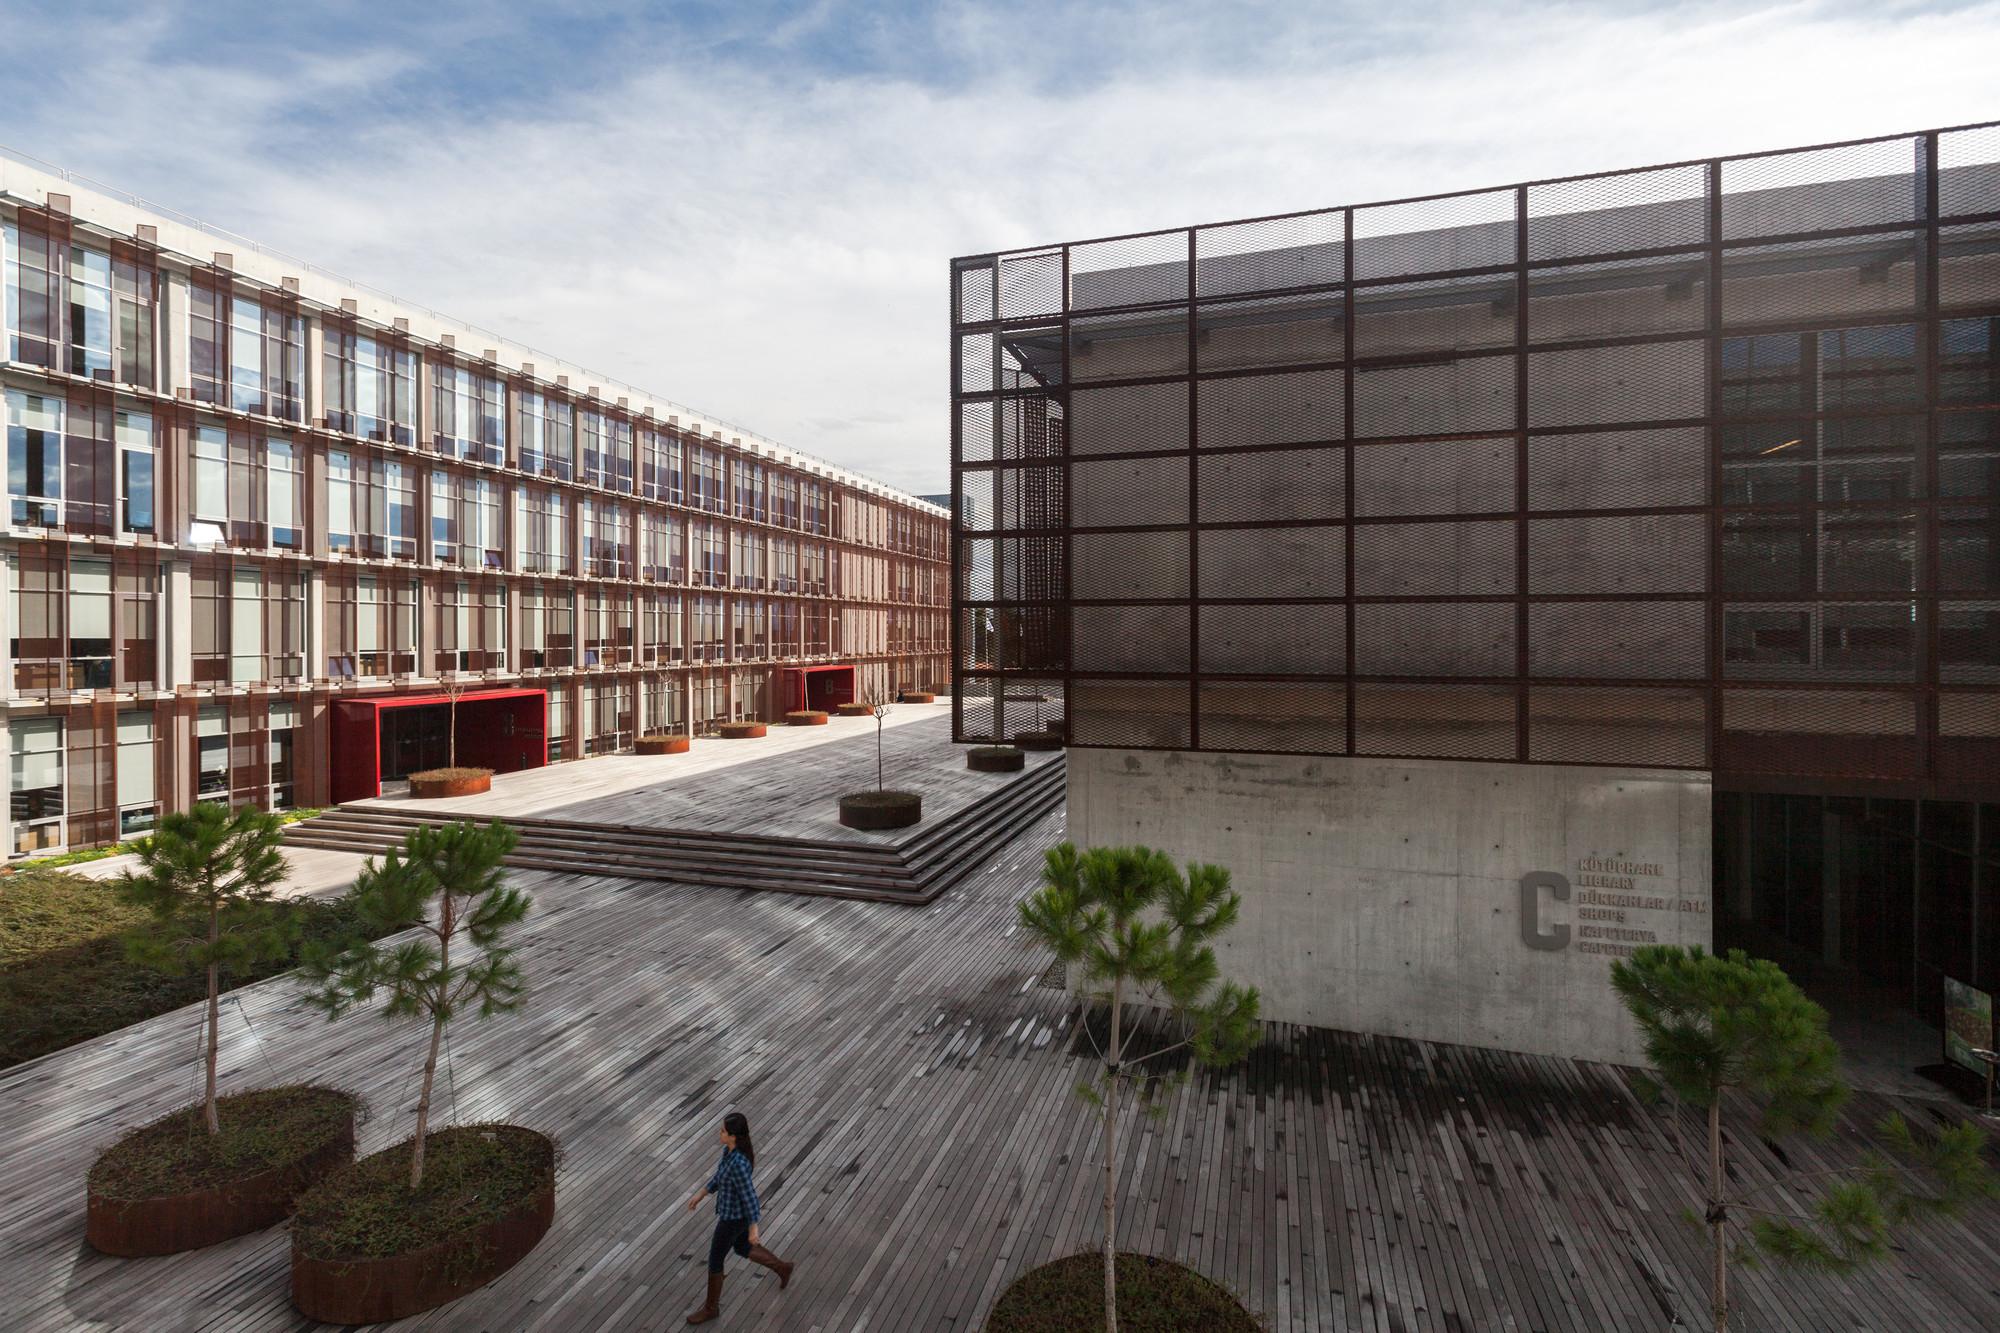 Universidad Parítima Piri Reis / Kreatif Architects, © Yercekim Photography-Omer Kanipak